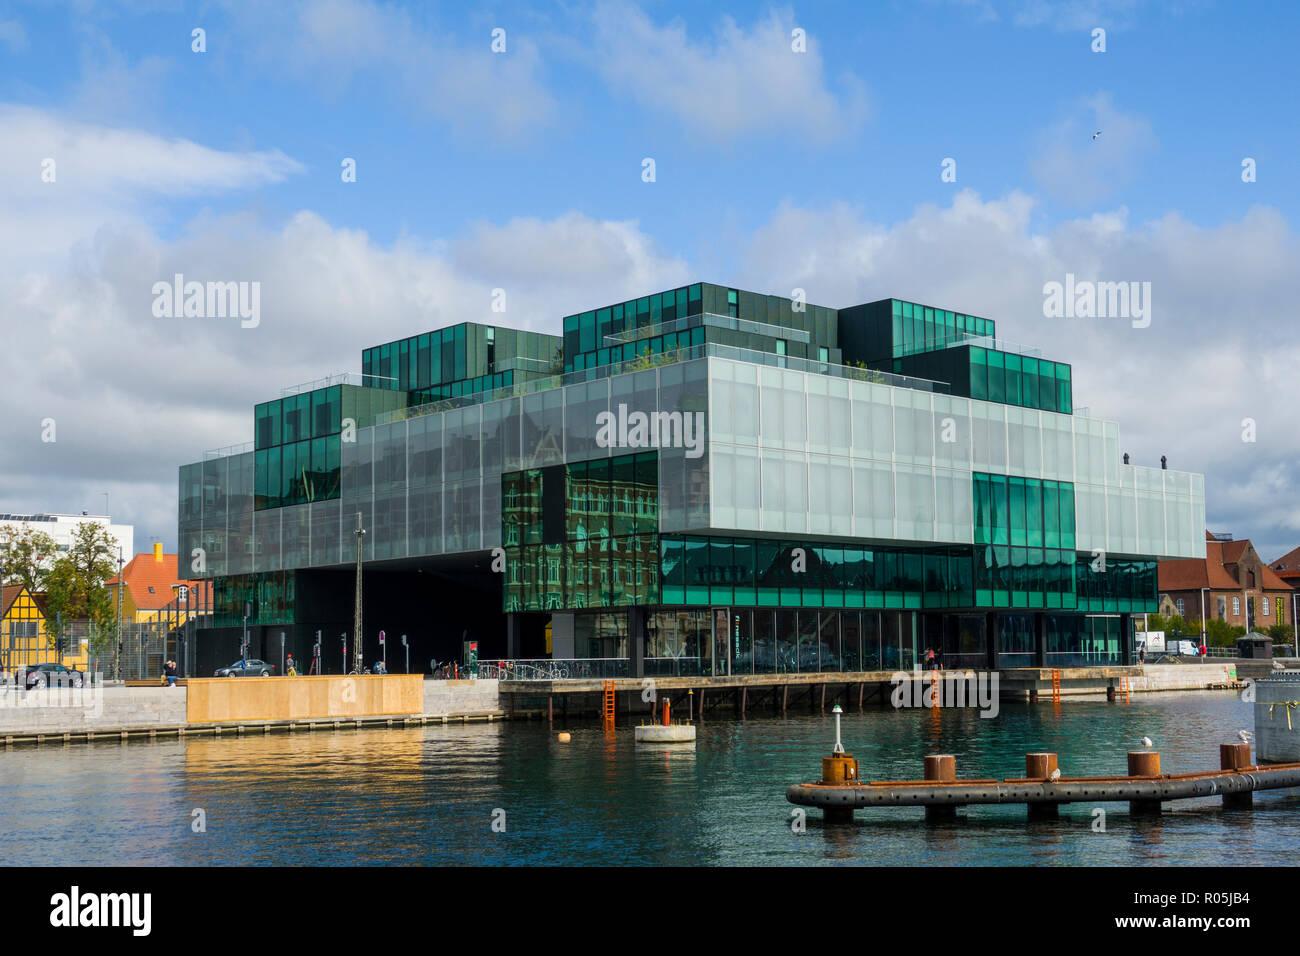 The modern Blox Building Copenhagen Denmark capital city - Stock Image